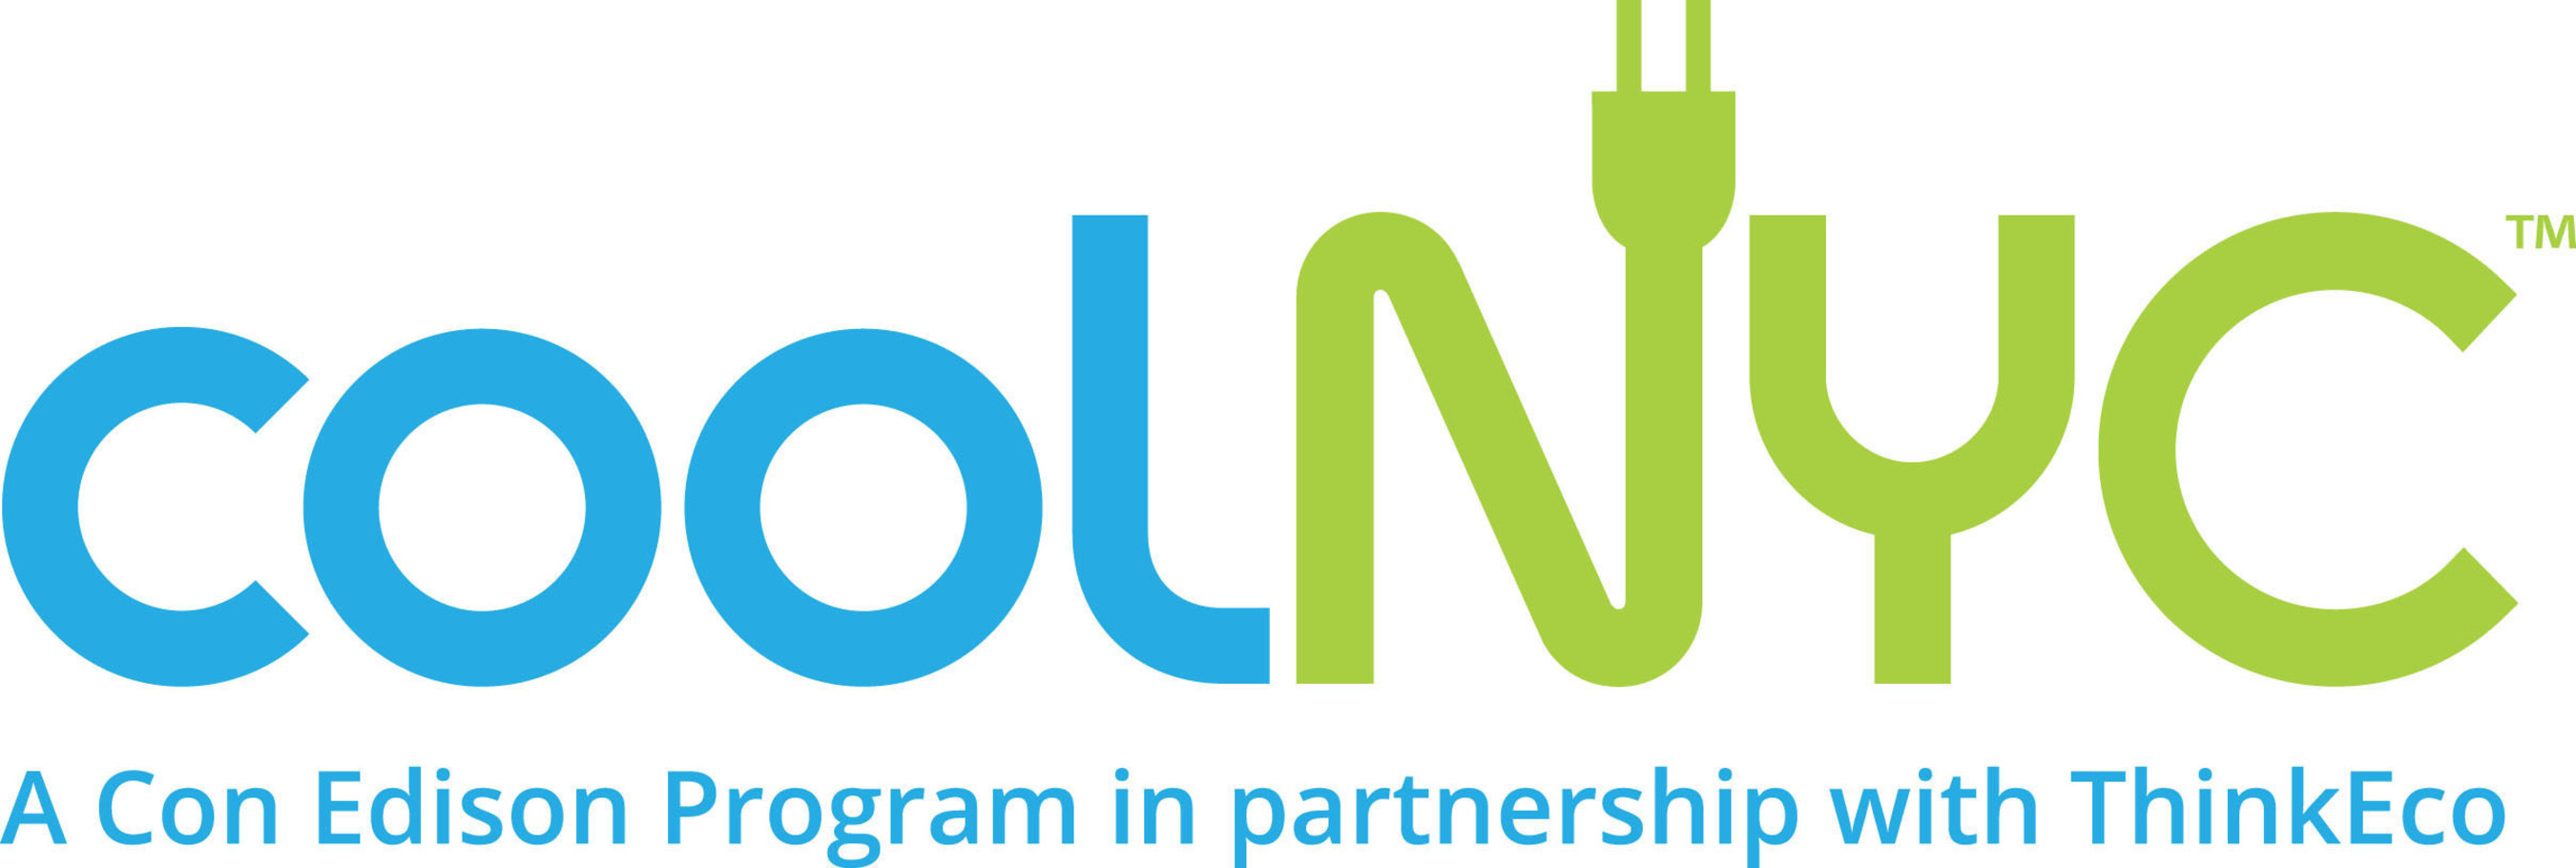 coolNYC Program, a Con Edison Program in partnership with ThinkEco.